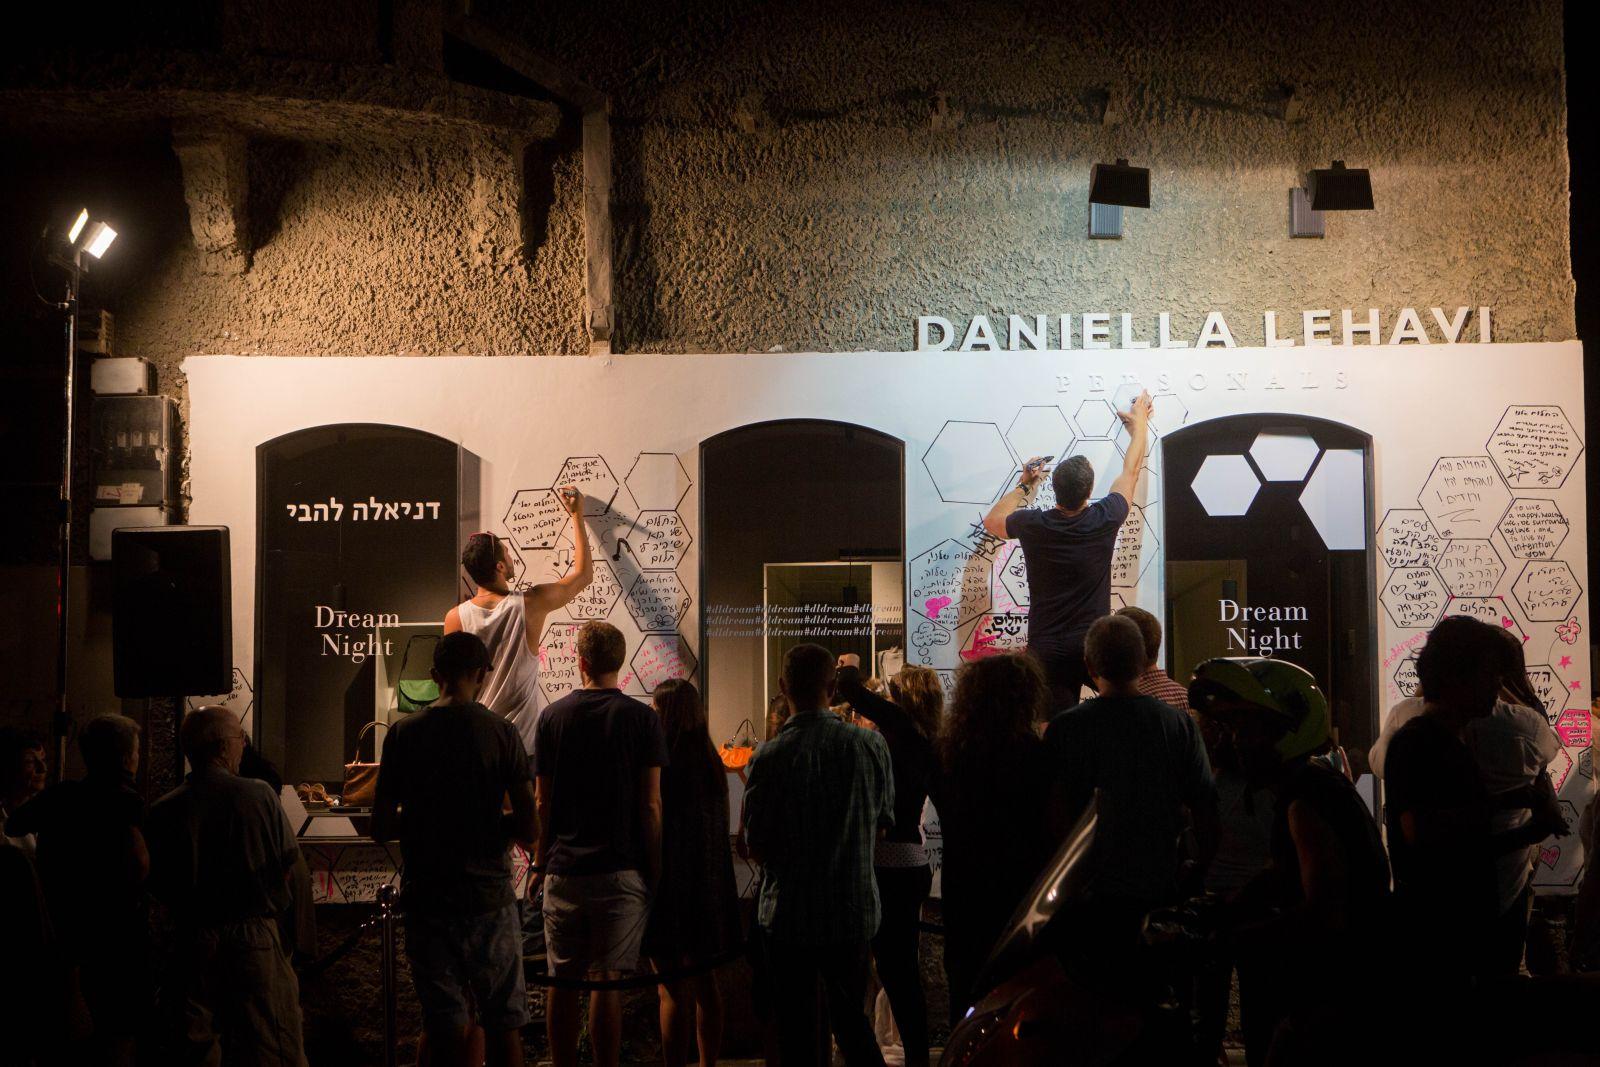 Israelis attend Tel Aviv's White Night all-night celebration in Tel Aviv, Israel, Thursday, June 25, 2014. Photo by Miriam Alster/Flash90